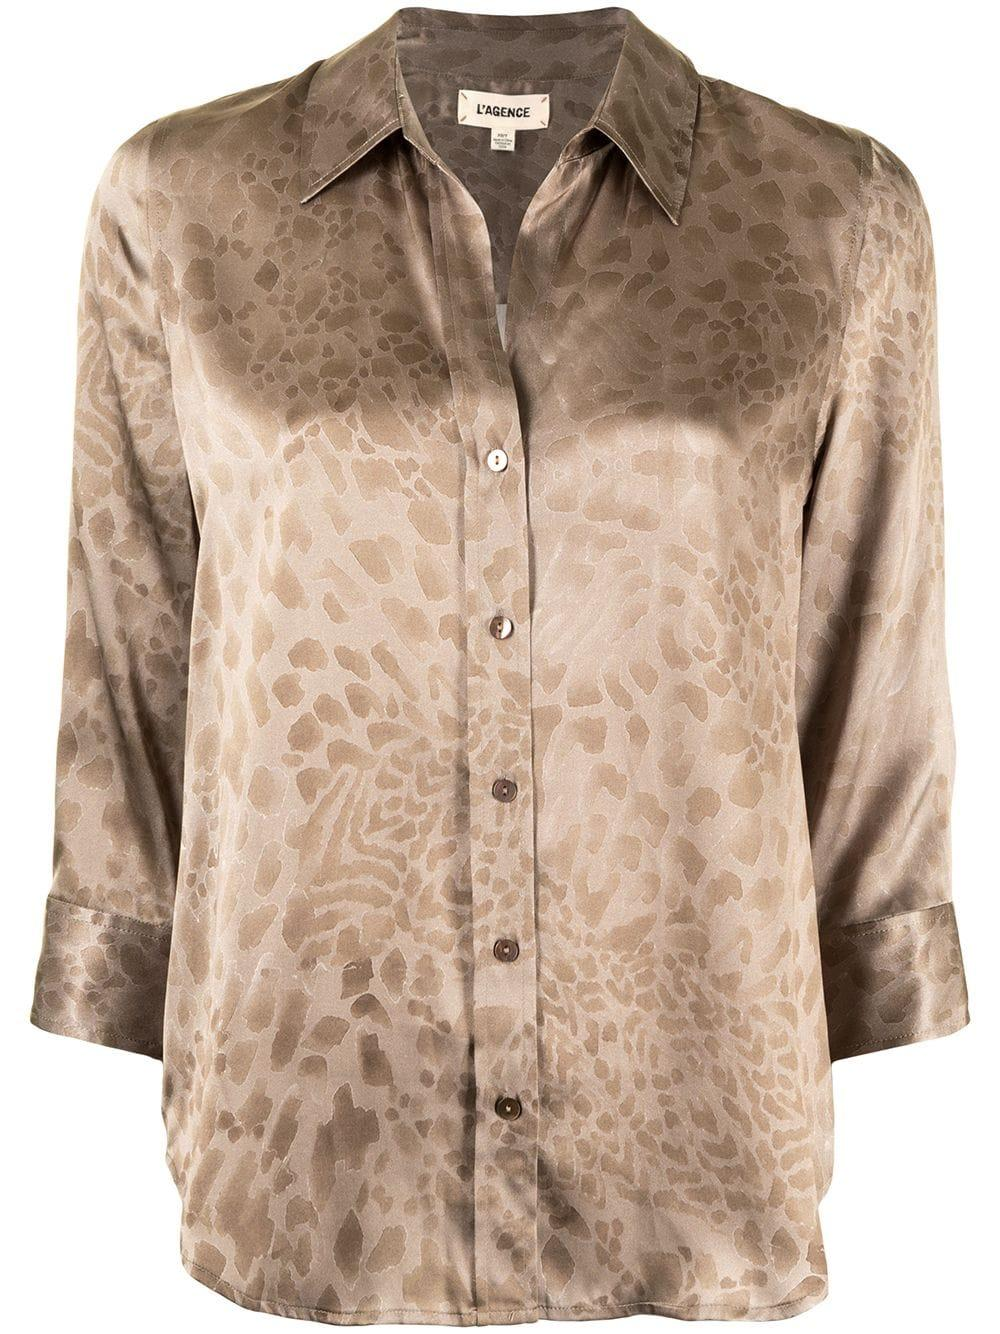 Dani Leopard Print Blouse